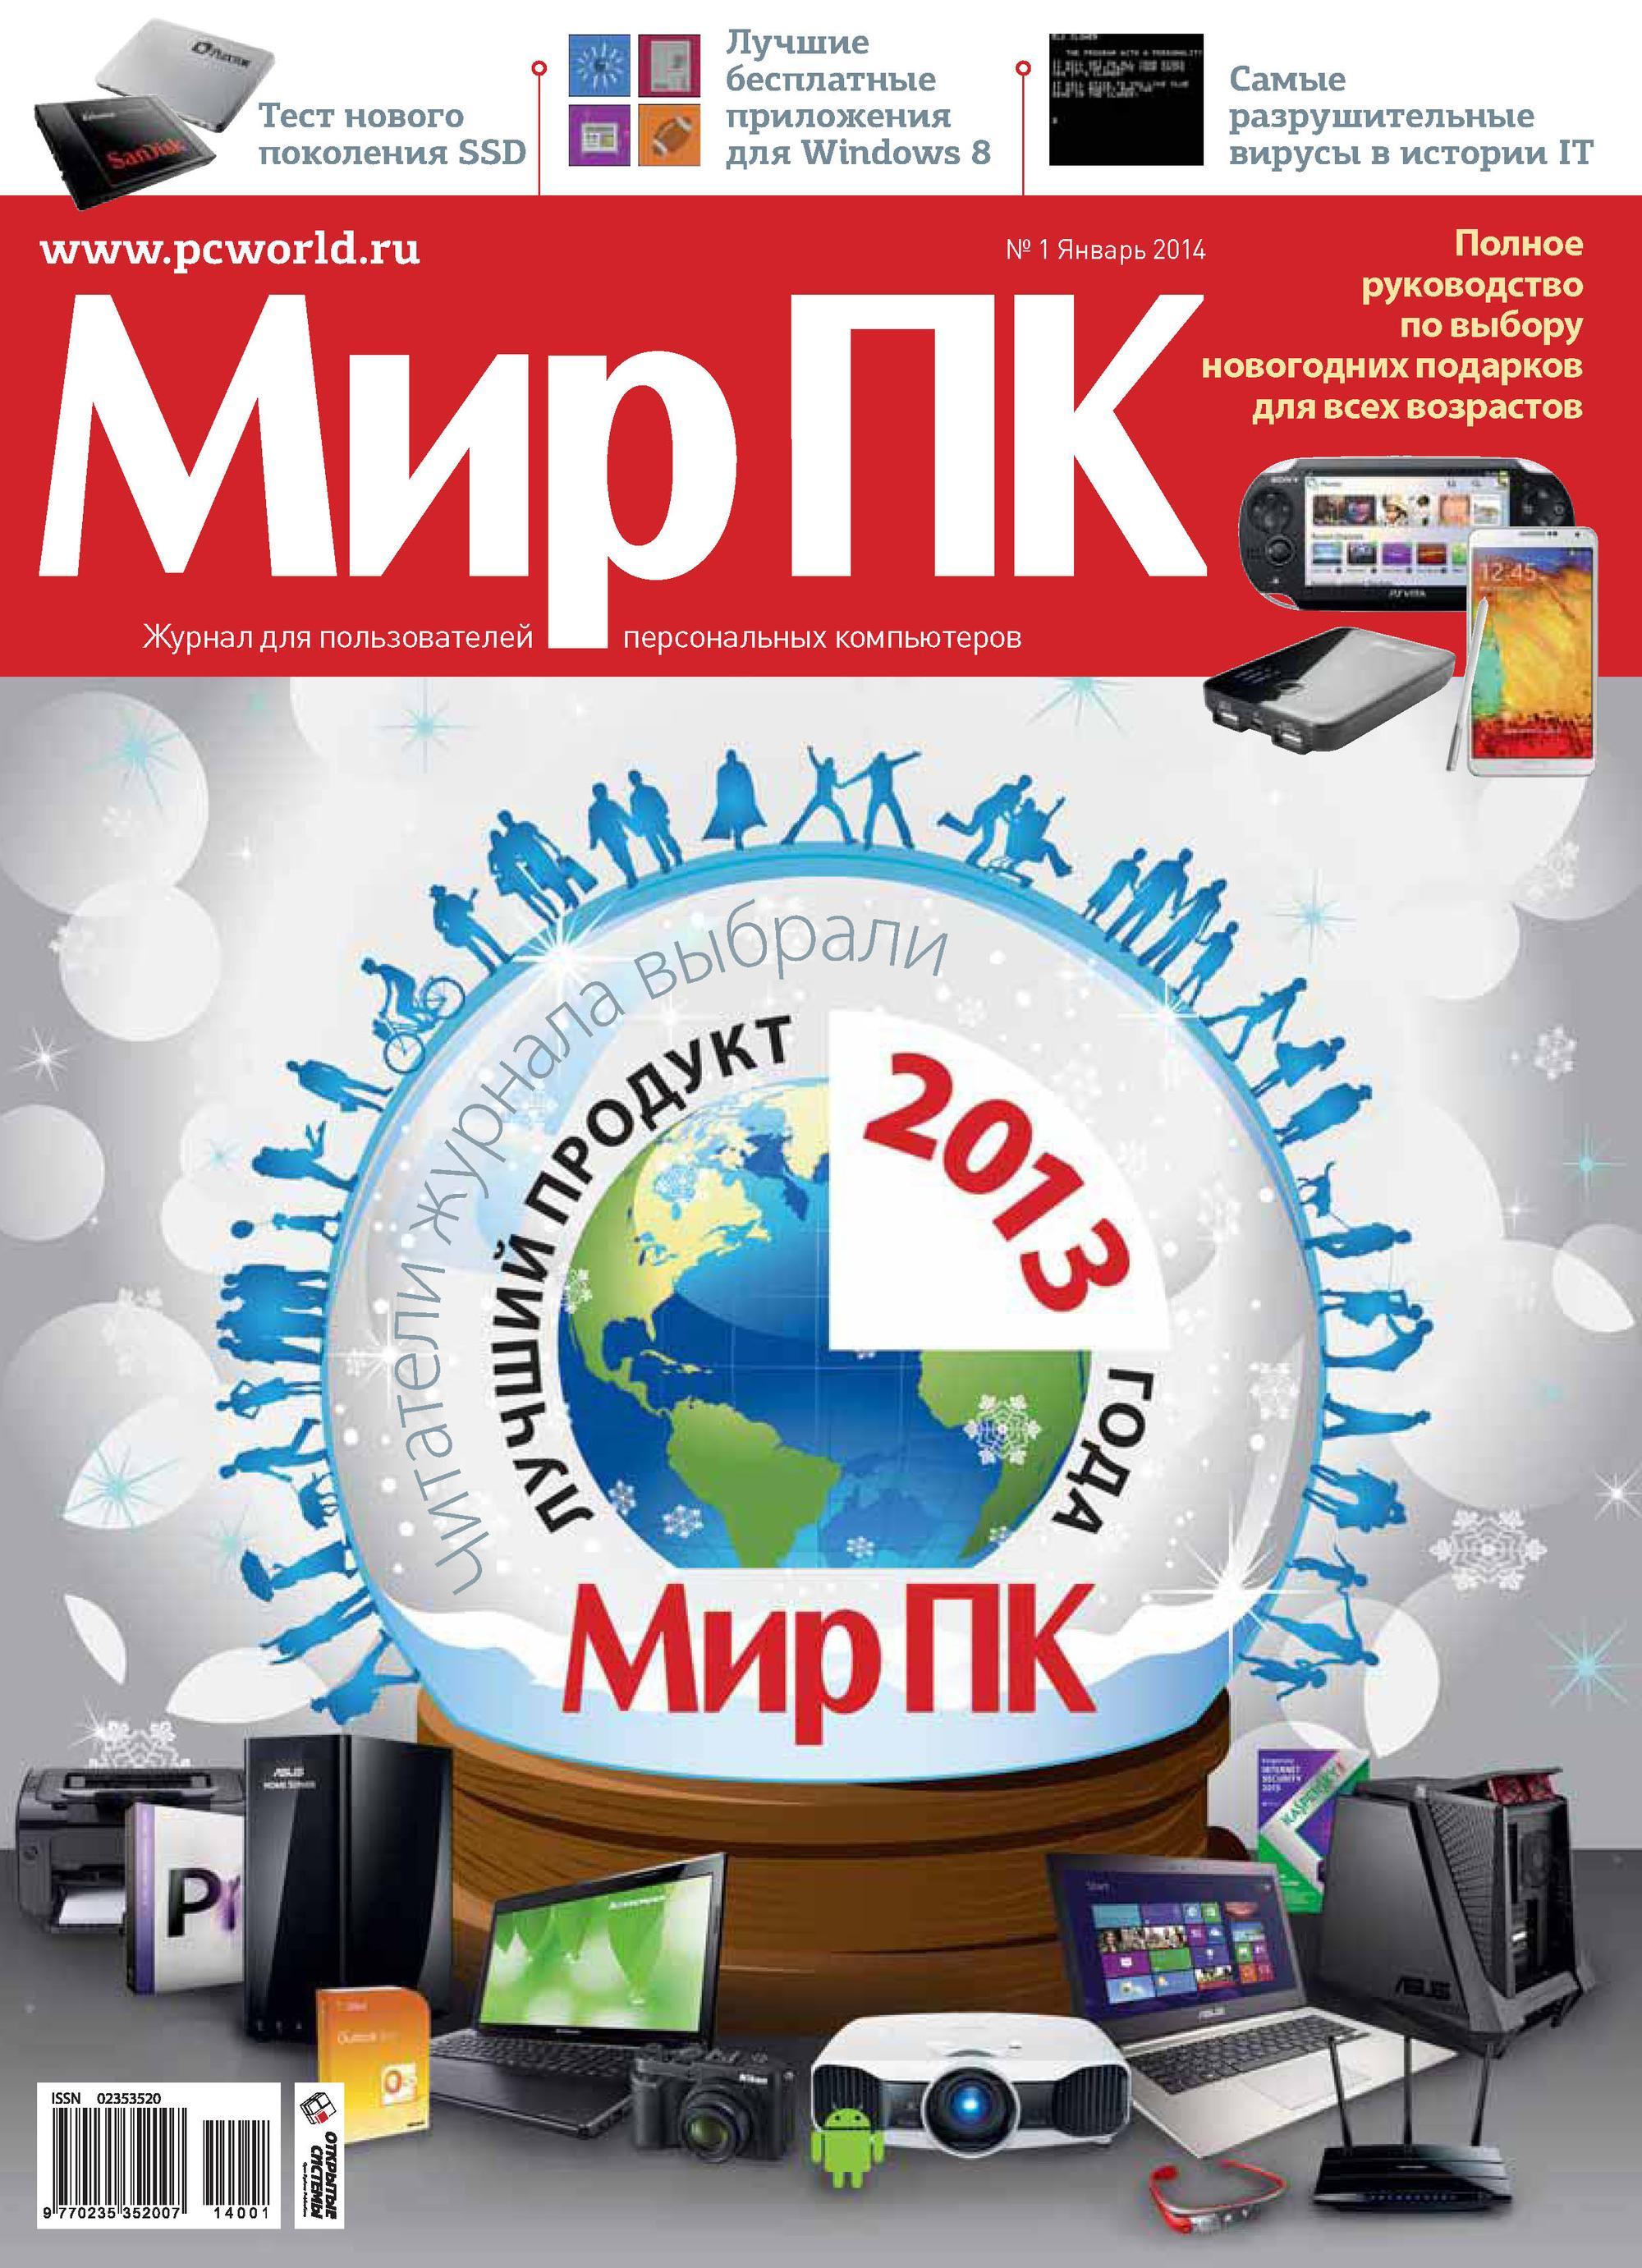 Мир ПК Журнал «Мир ПК» №01/2014